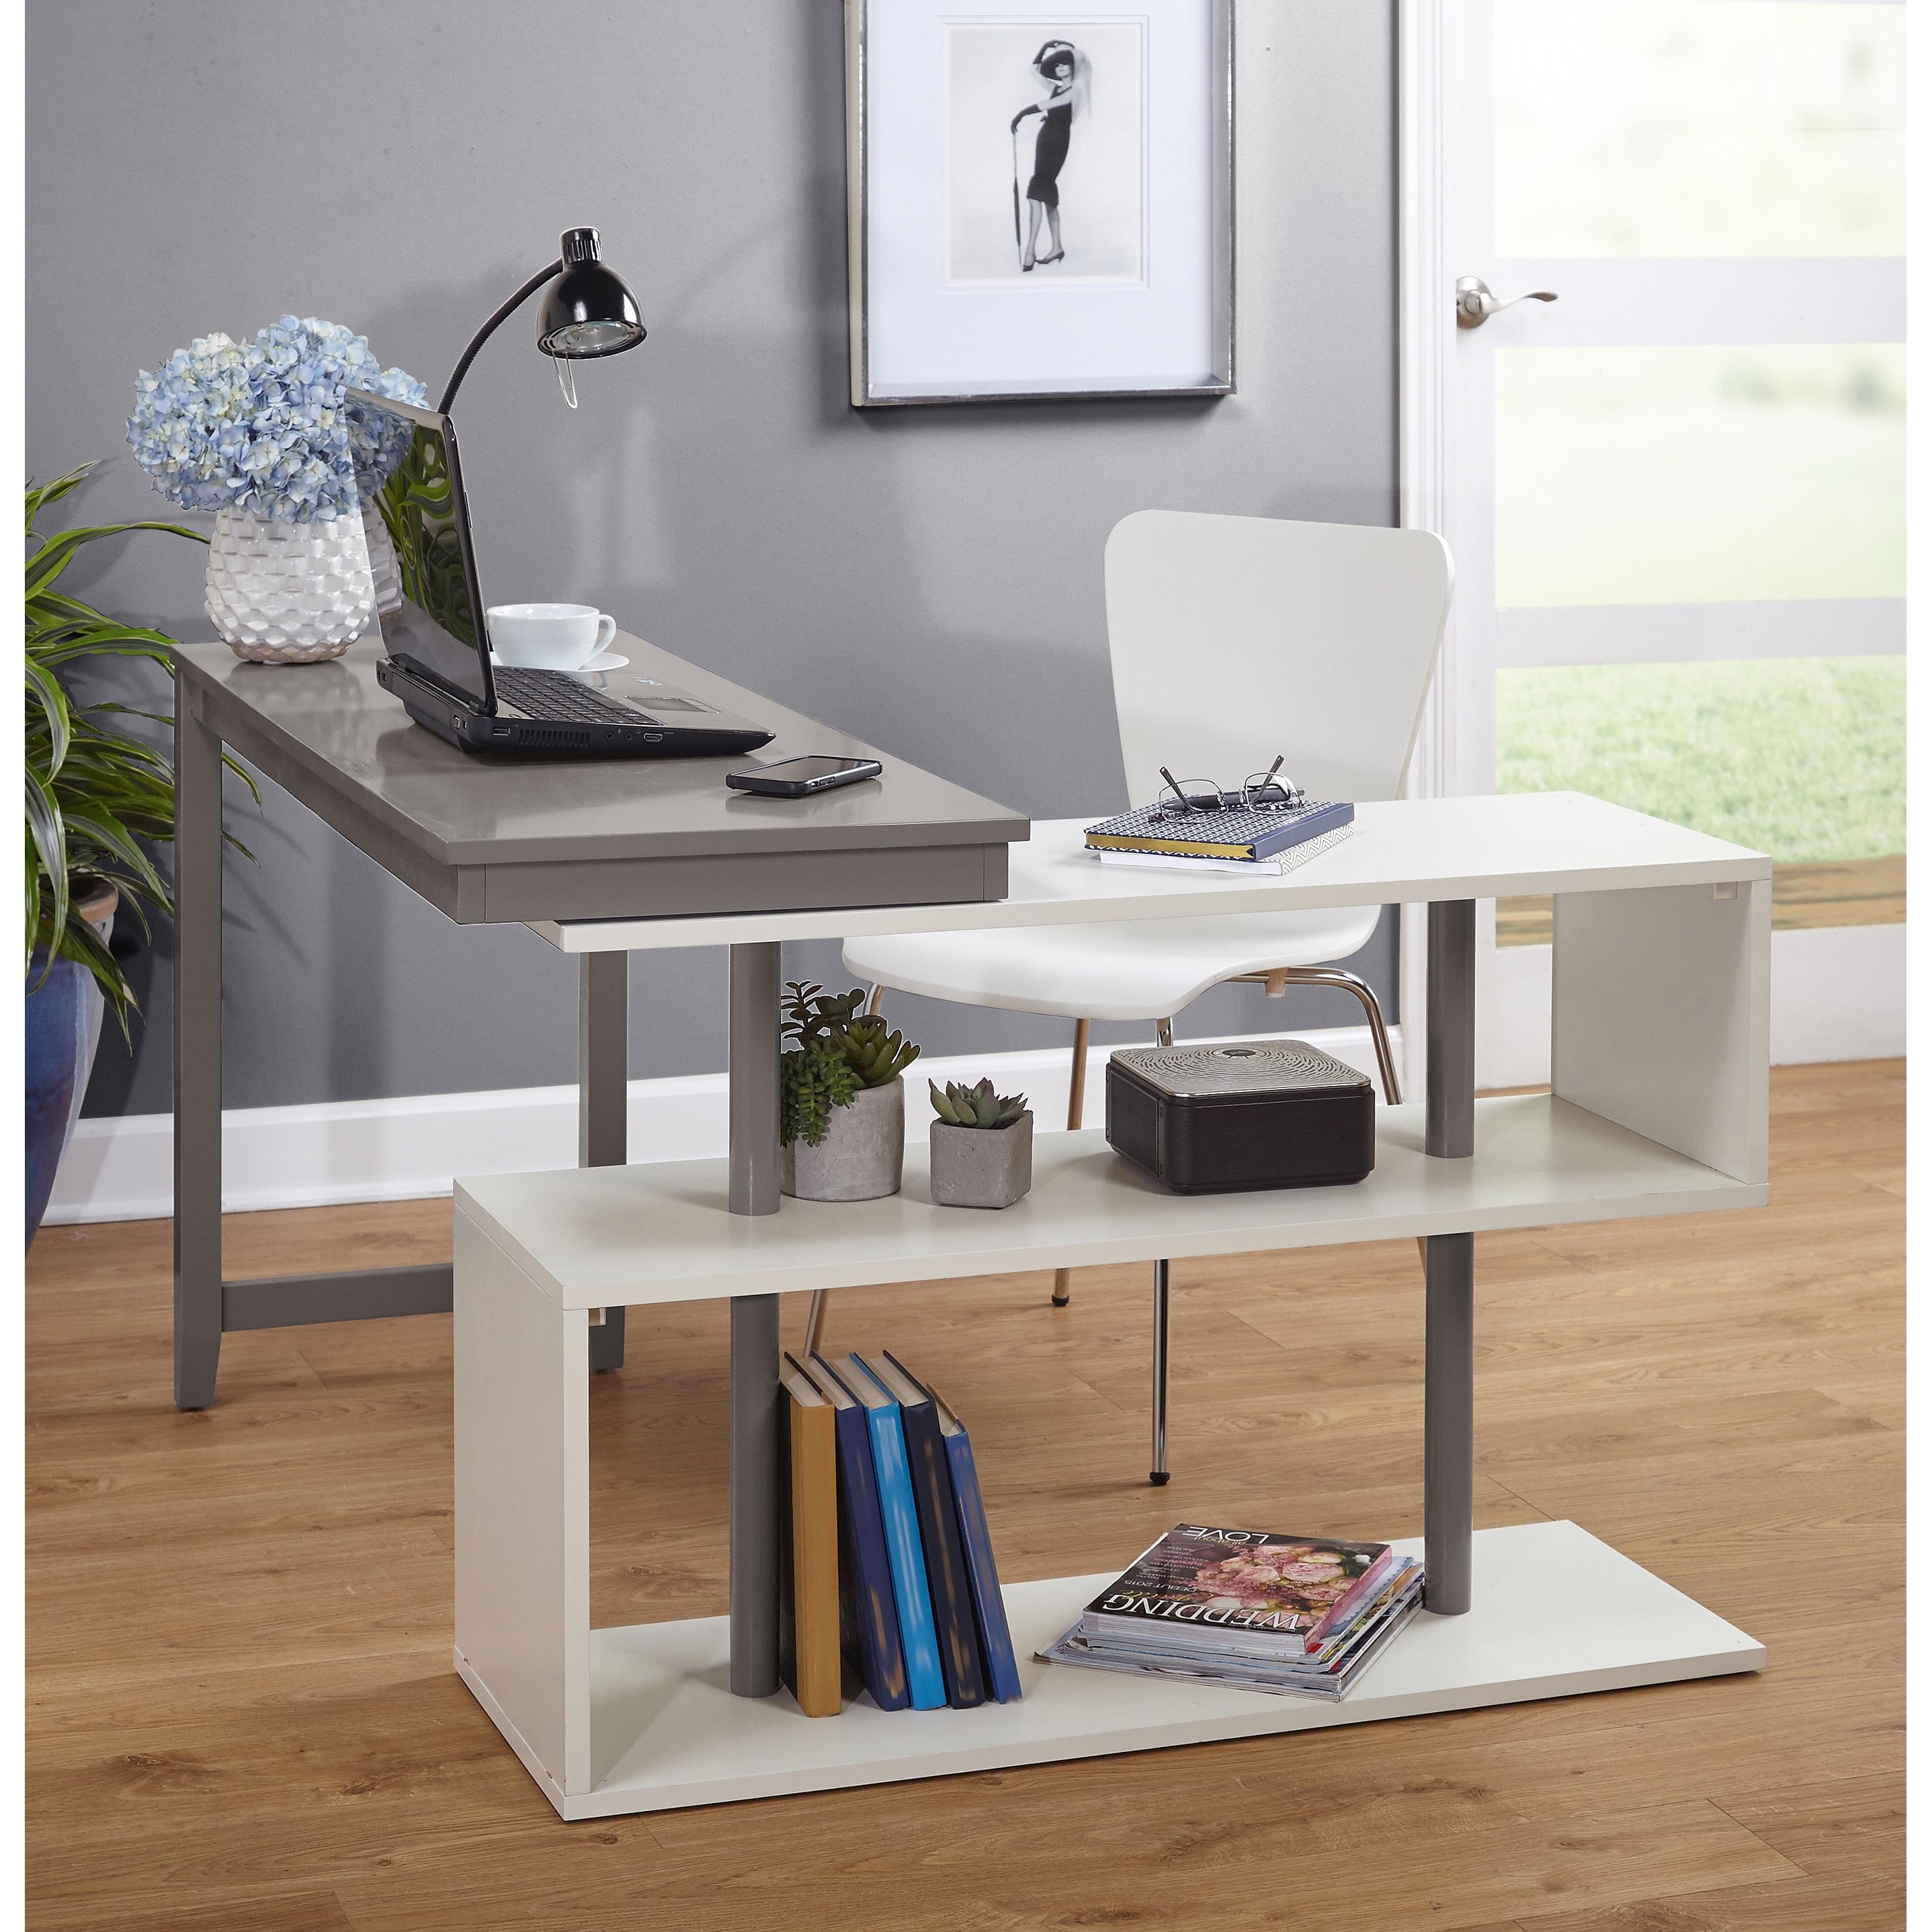 L Shape Corner Computer Desk Laptop Office Furniture Table